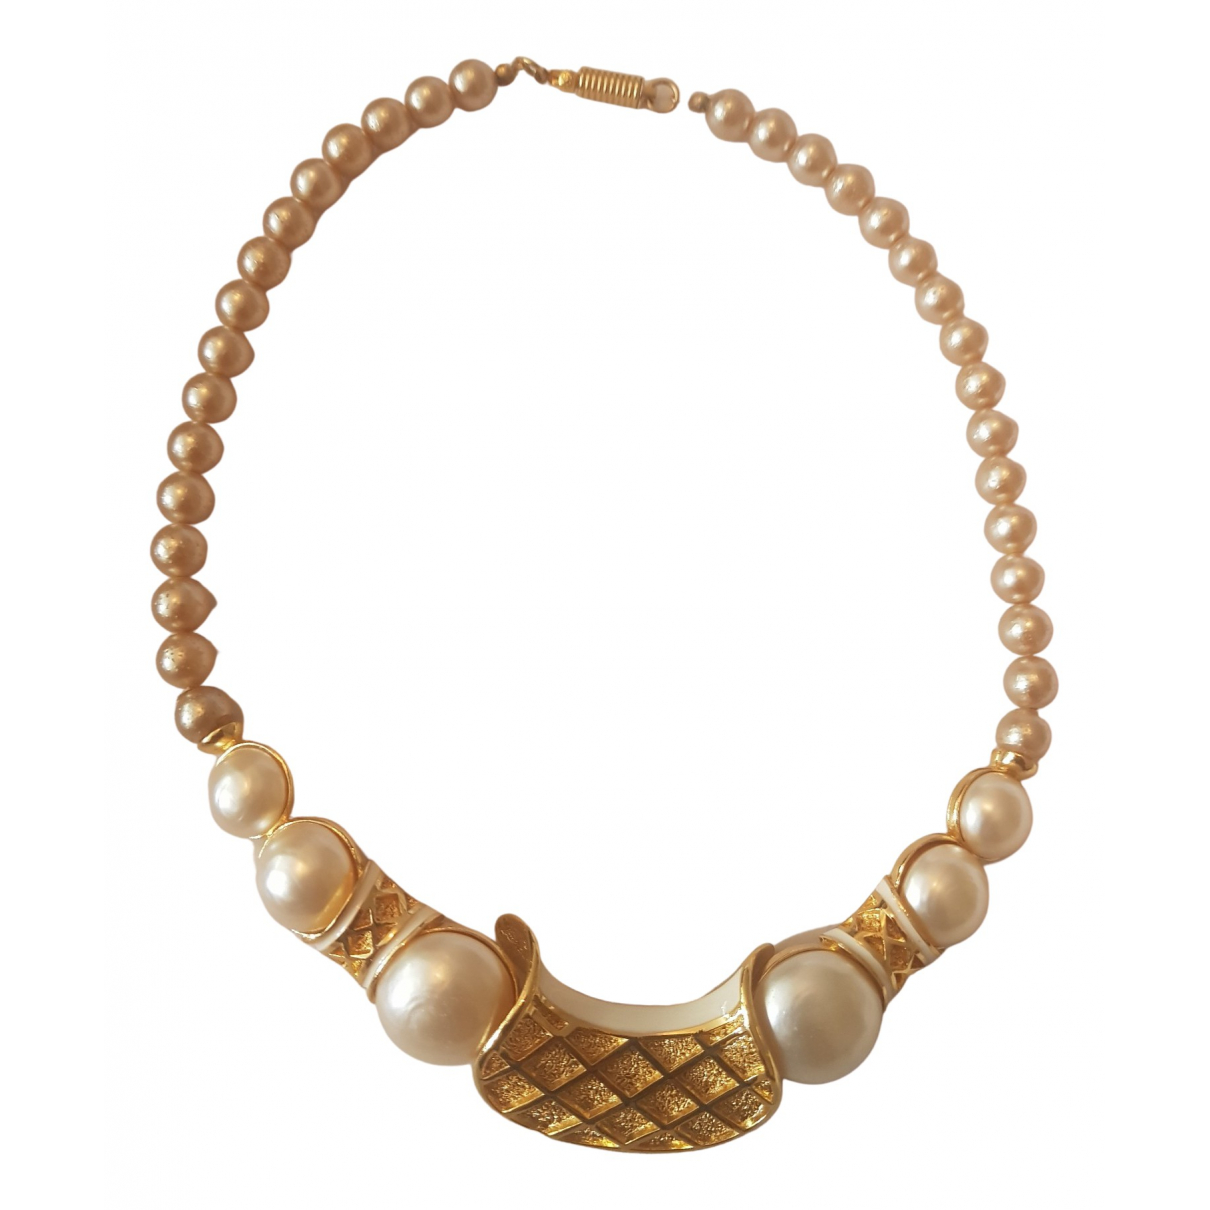 Balenciaga \N Pearls necklace for Women \N